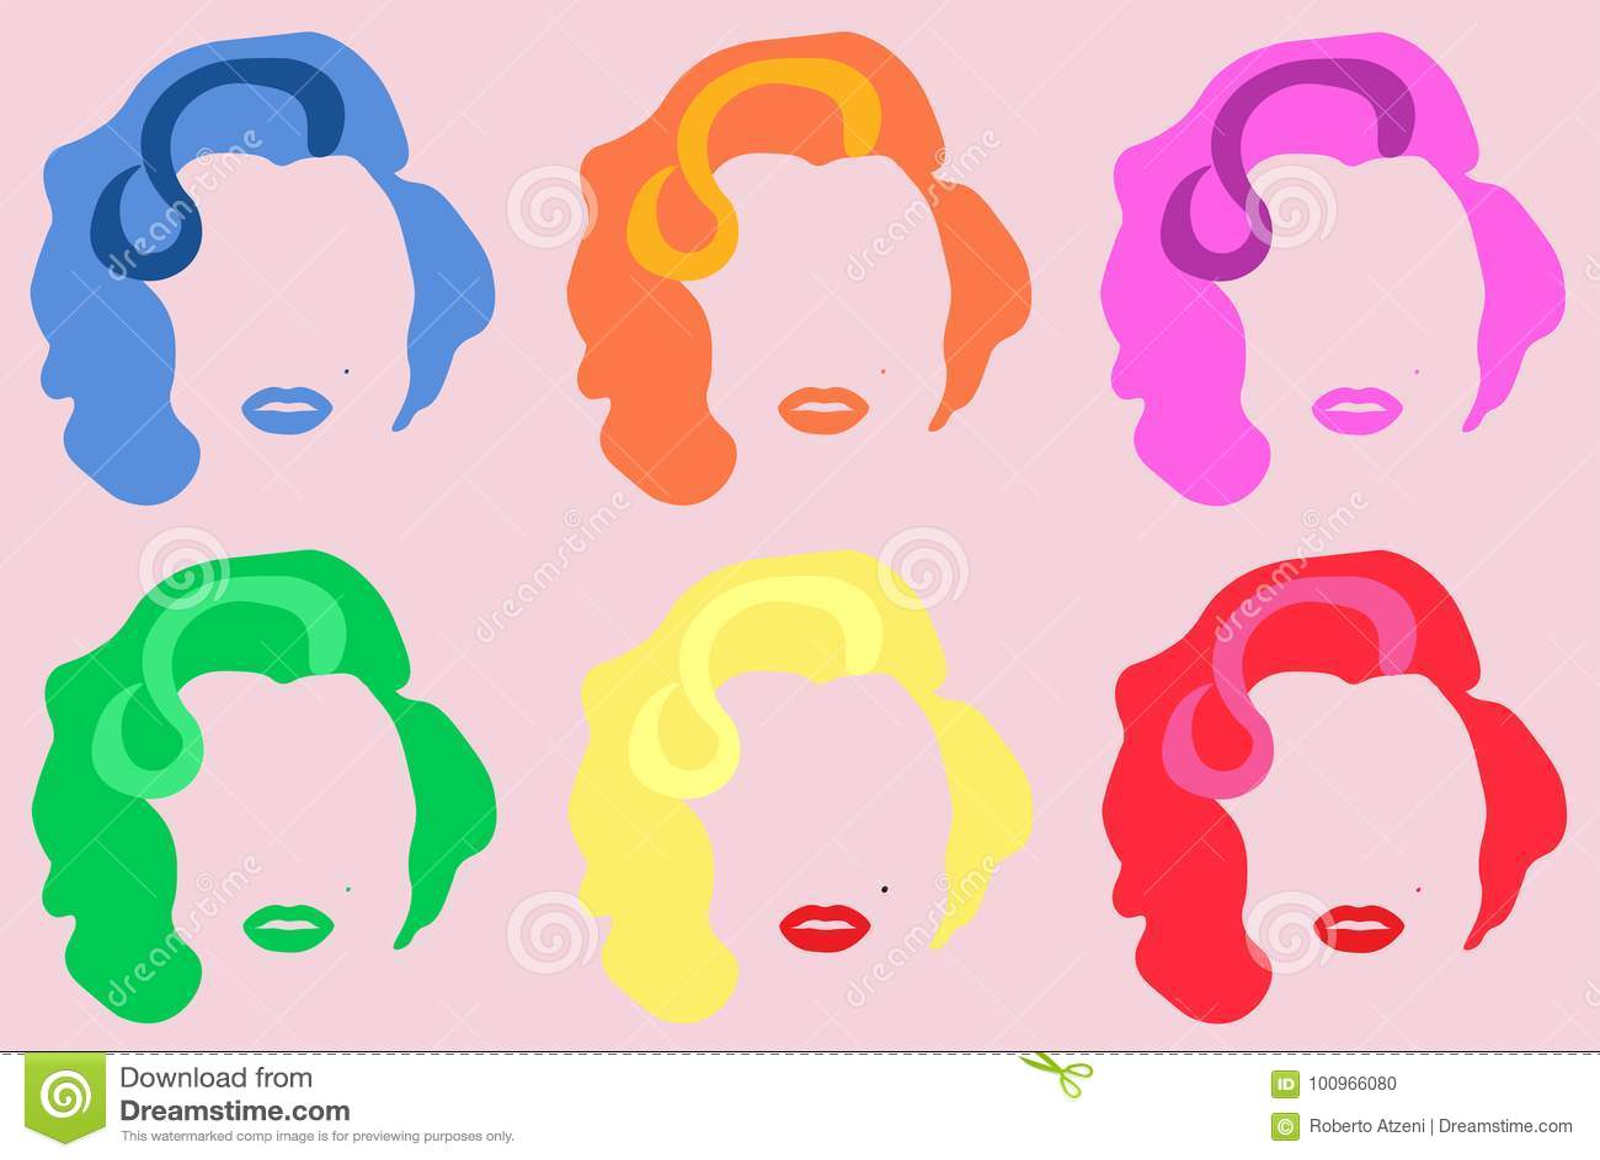 Marilyn Monroe Colored Vetora Illustration Pop Art Style Andy Warhol